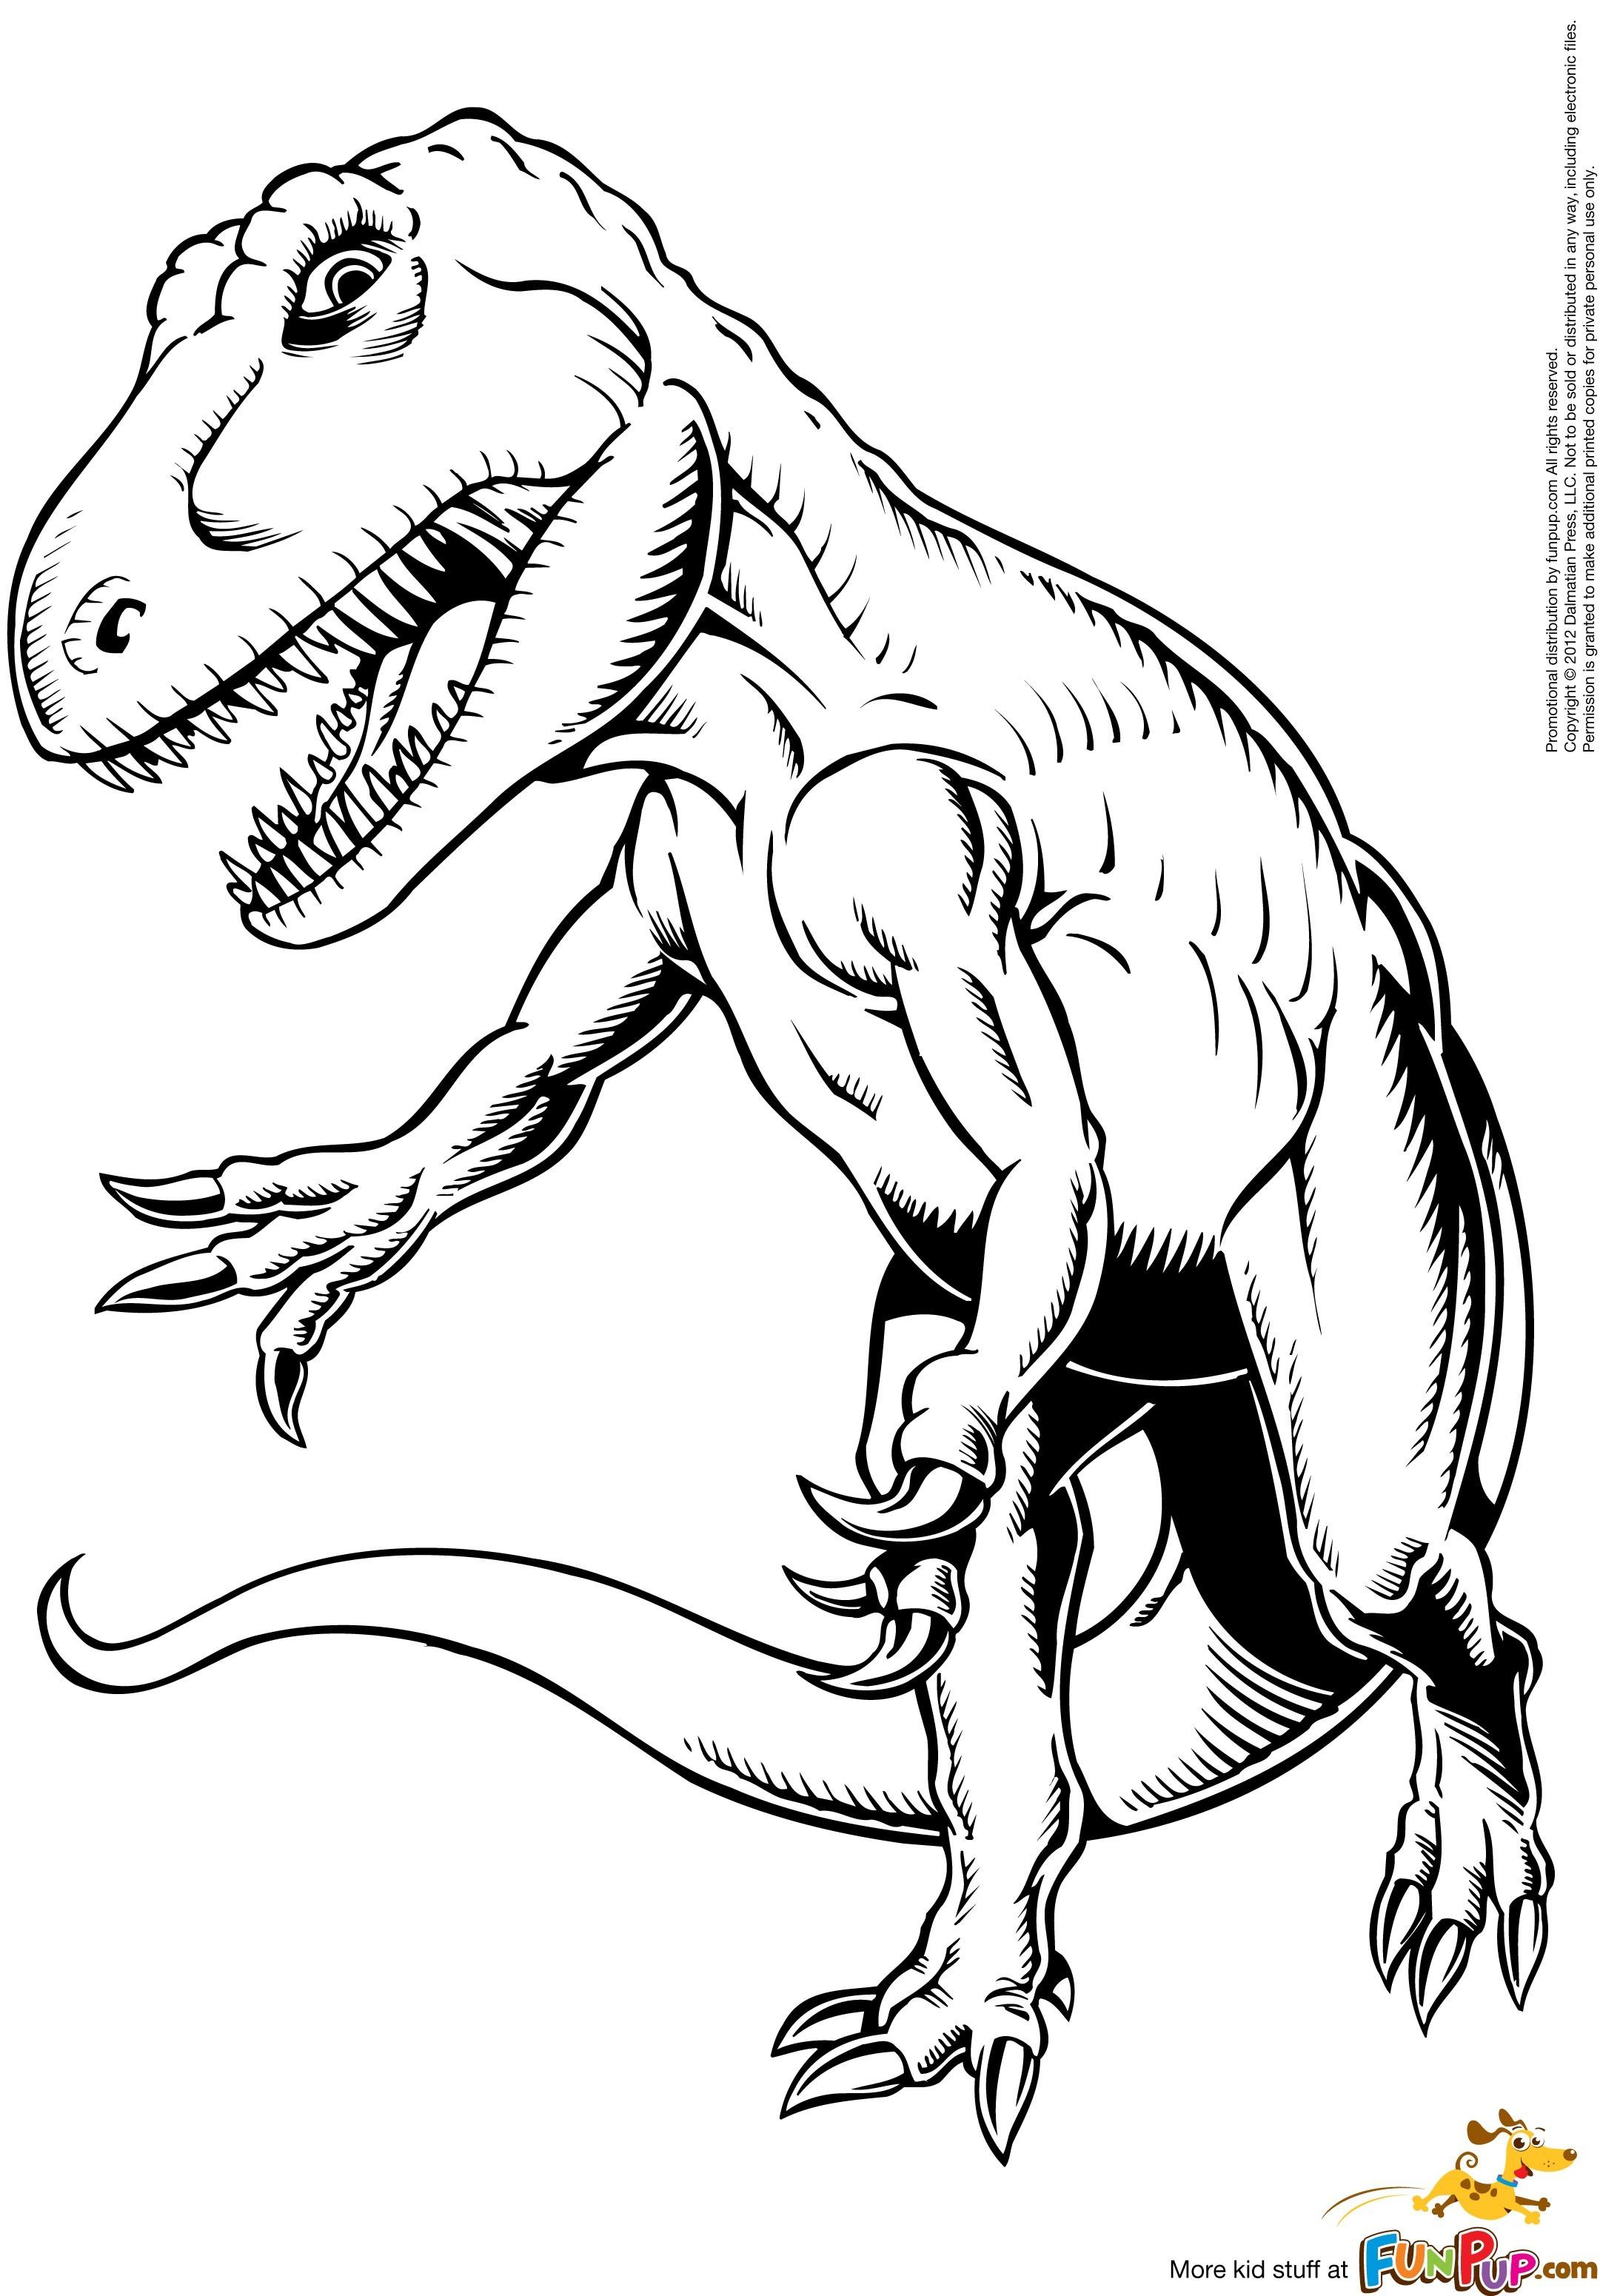 2161x3101 T Rex Dinosaur Coloring Page For Kids Unique Tyrannosaurus Rex